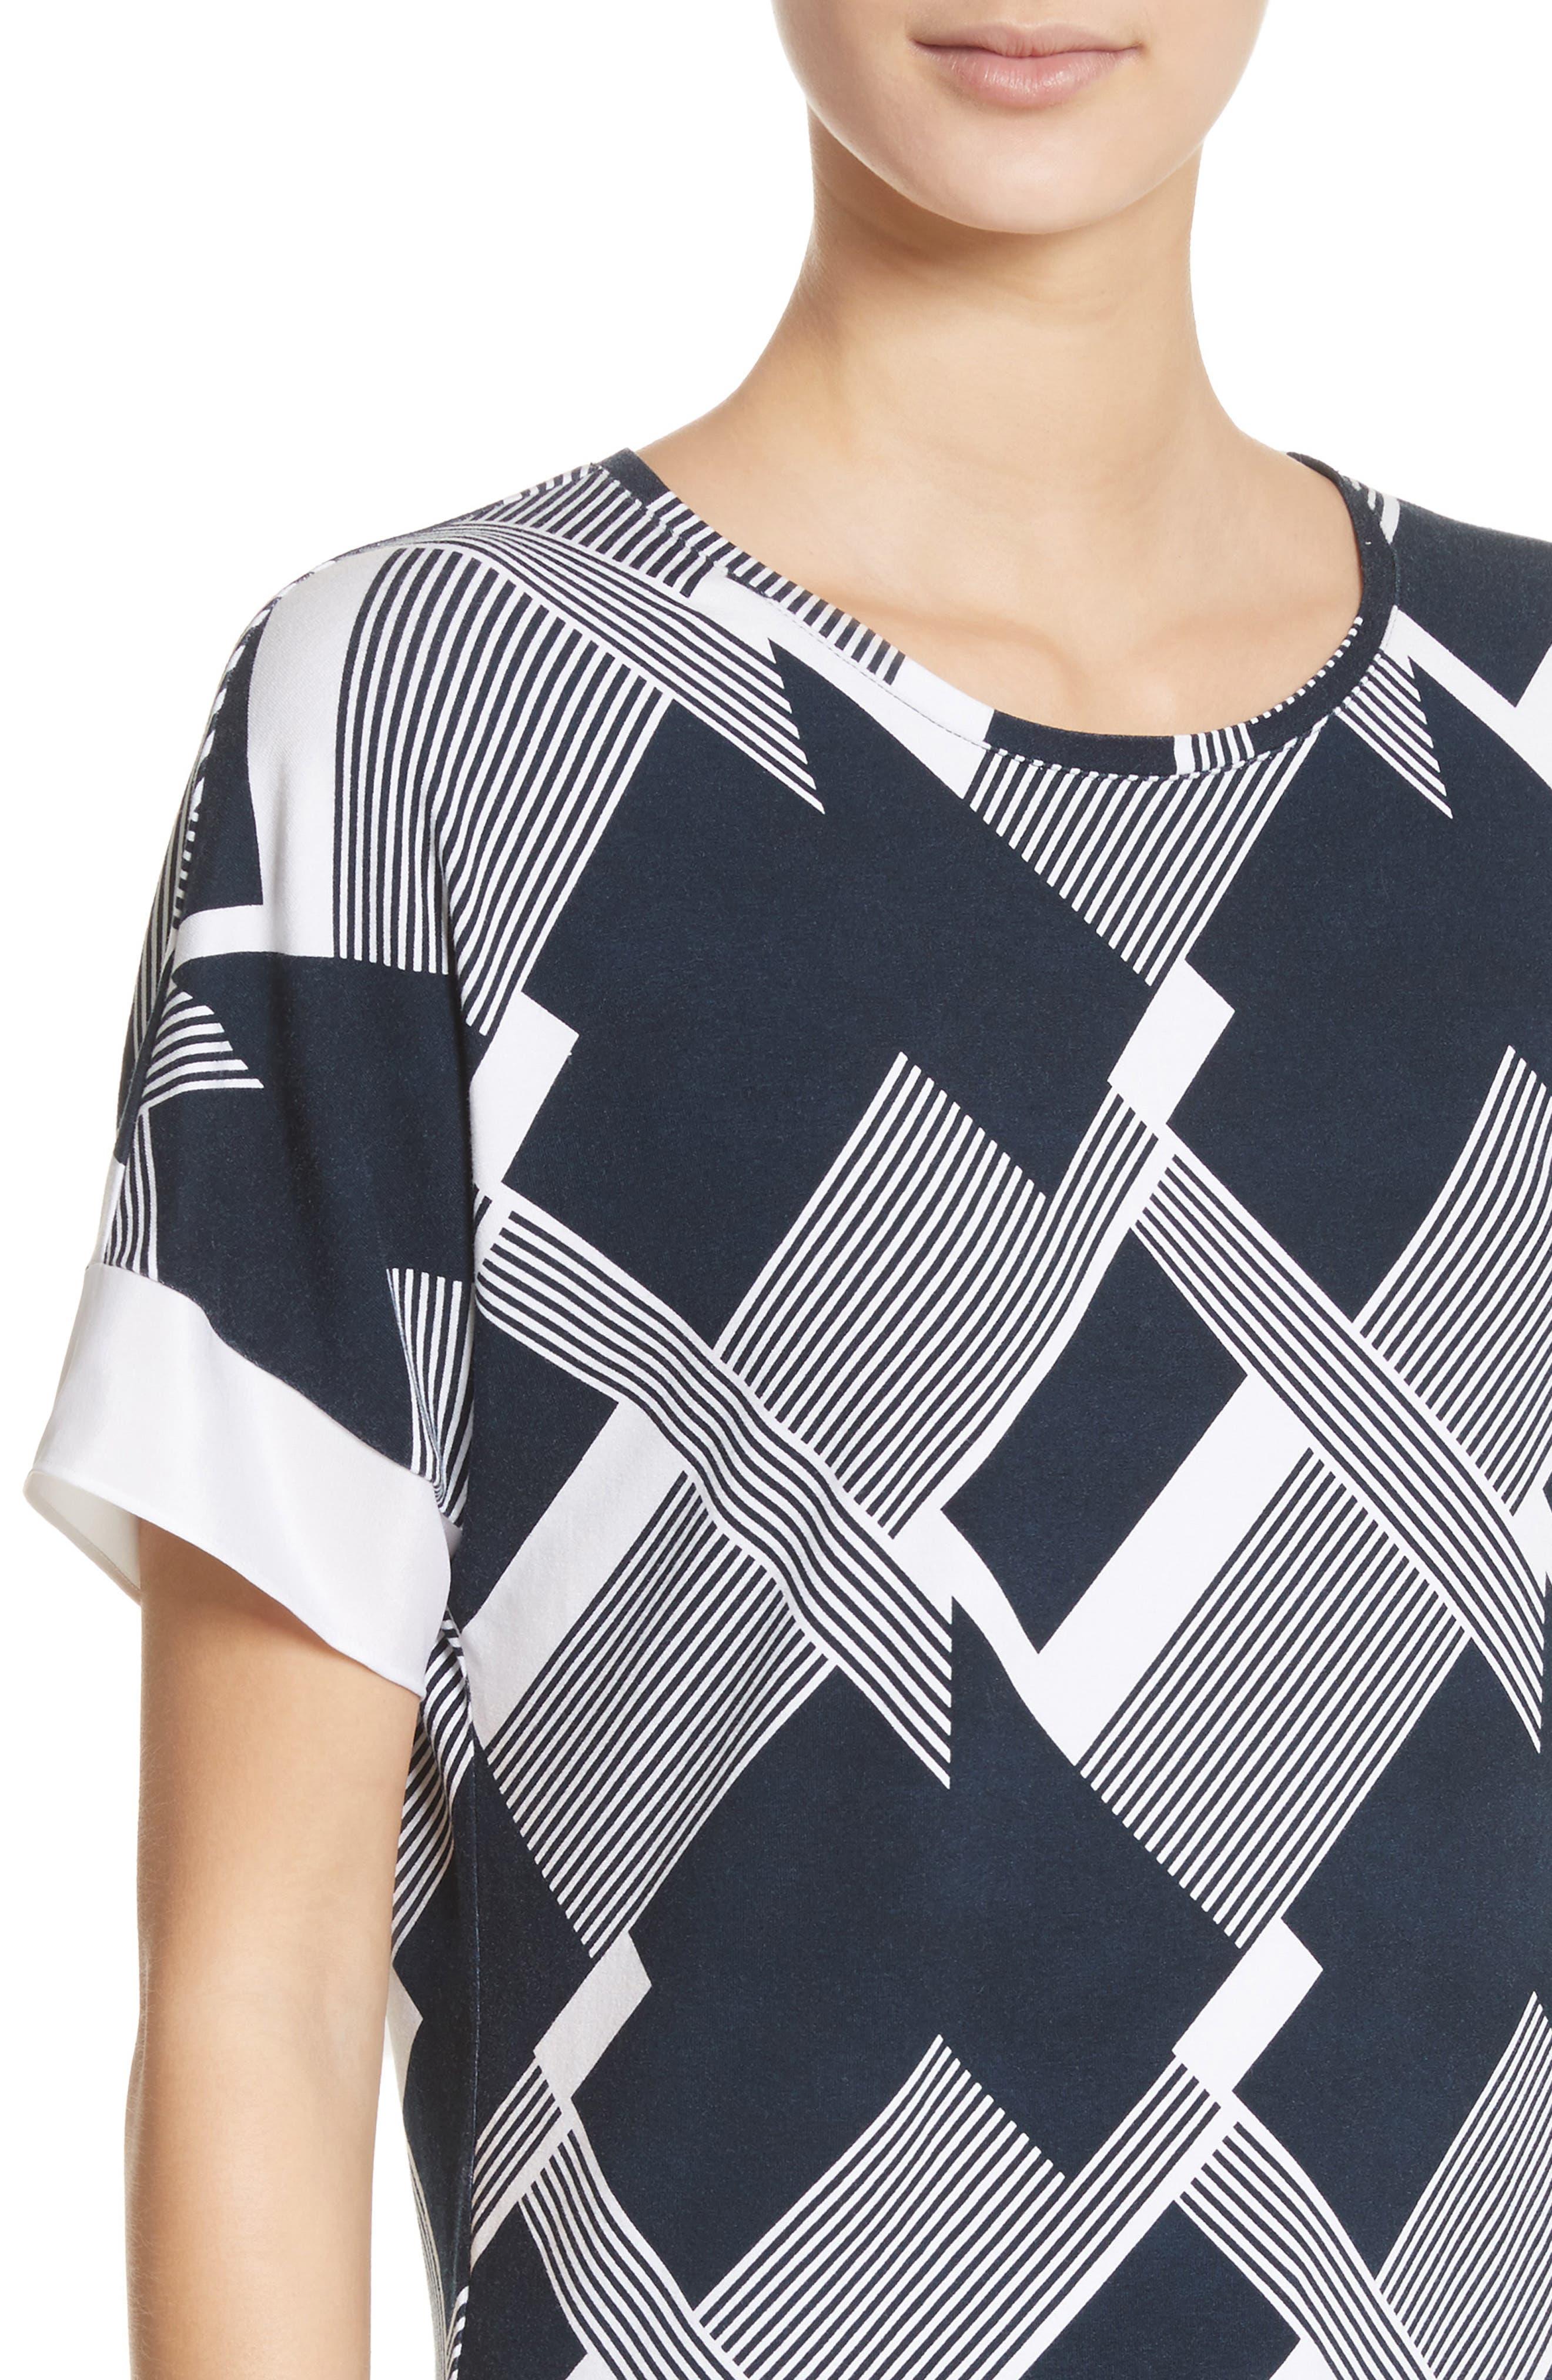 Geometric Line Print Tee,                             Alternate thumbnail 4, color,                             Navy/ Bianco